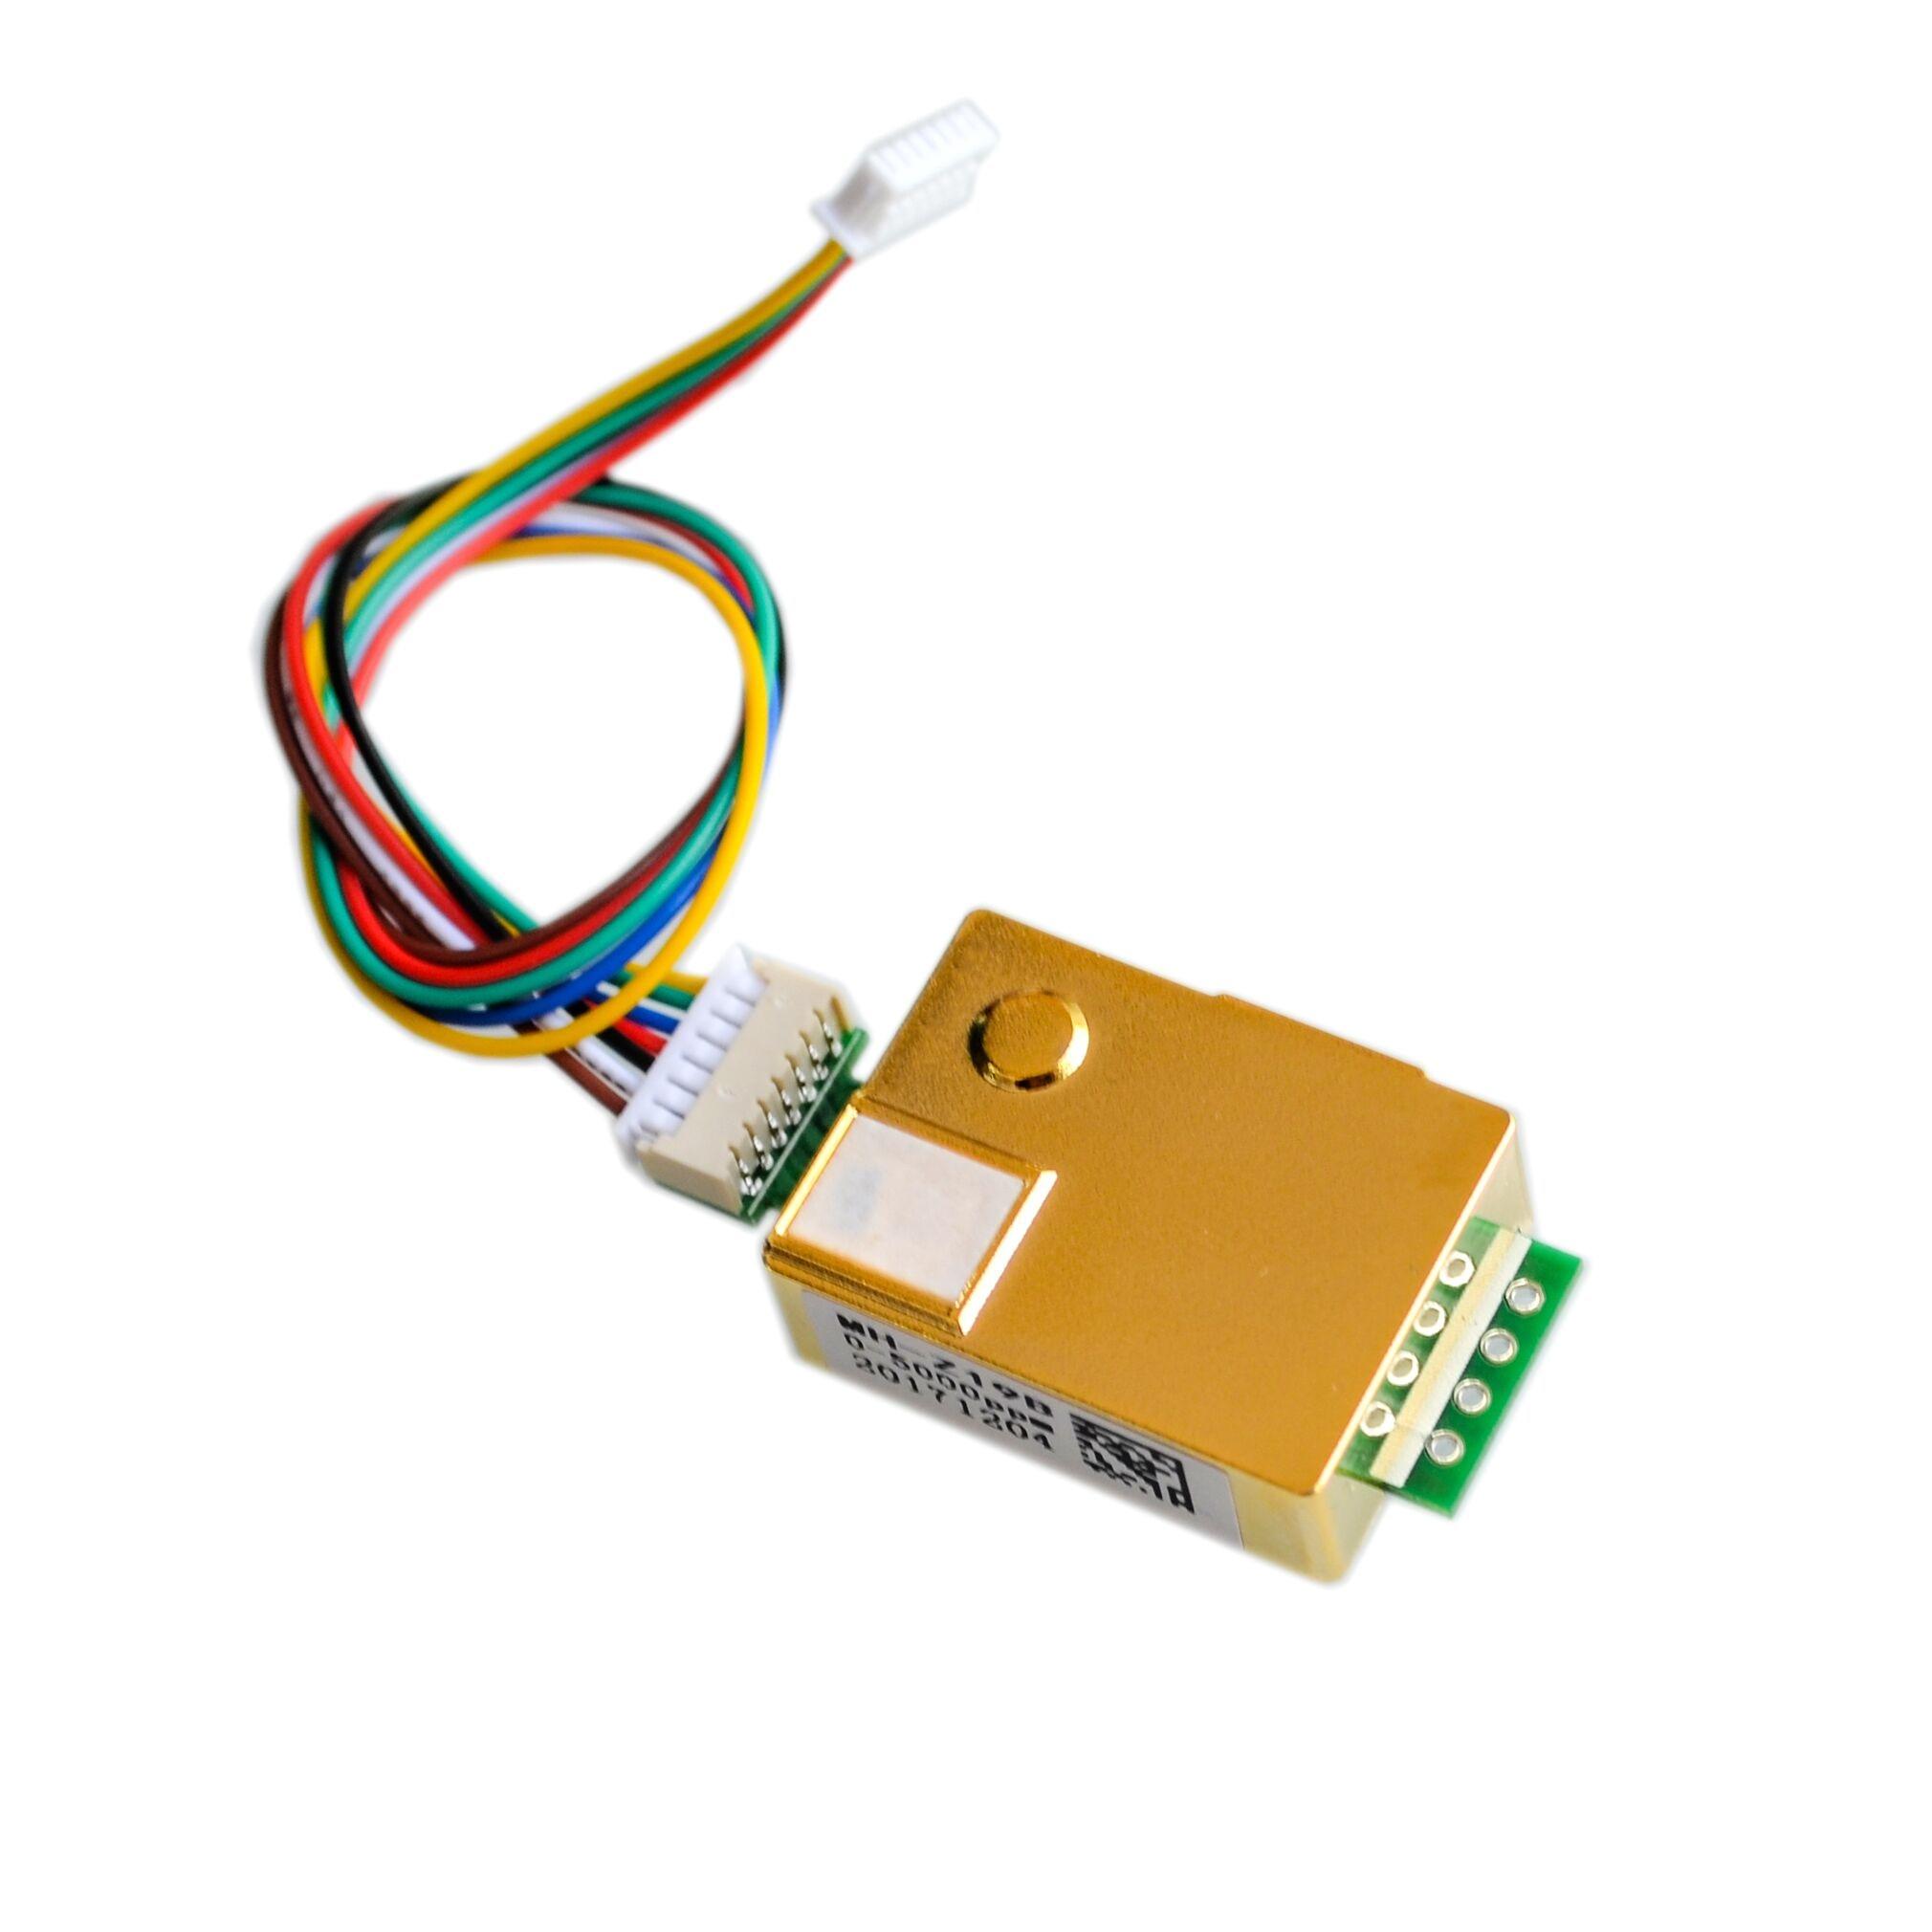 MH-Z19 инфракрасный датчик co2 для монитора co2 MH-Z19B инфракрасный датчик углекислого газа co2 0-5000ppm